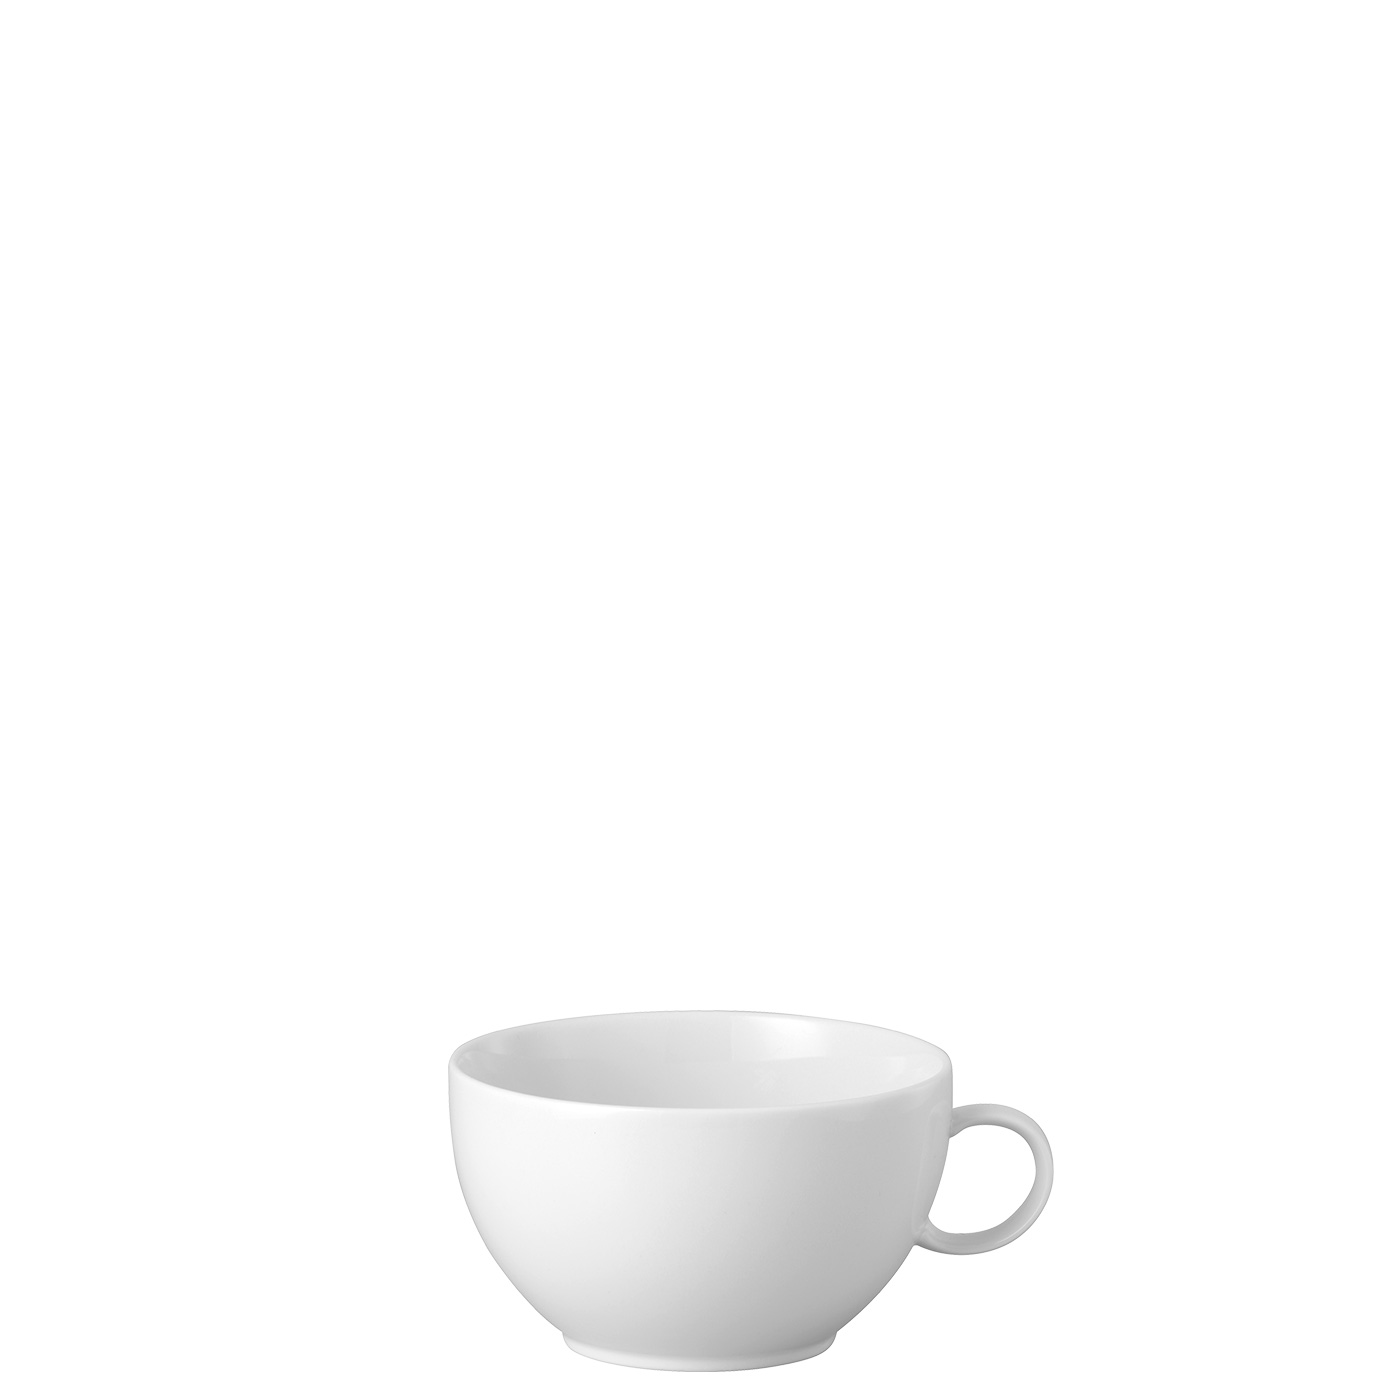 Cappuccino-Obertasse Sunny Day Weiss Thomas Porzellan